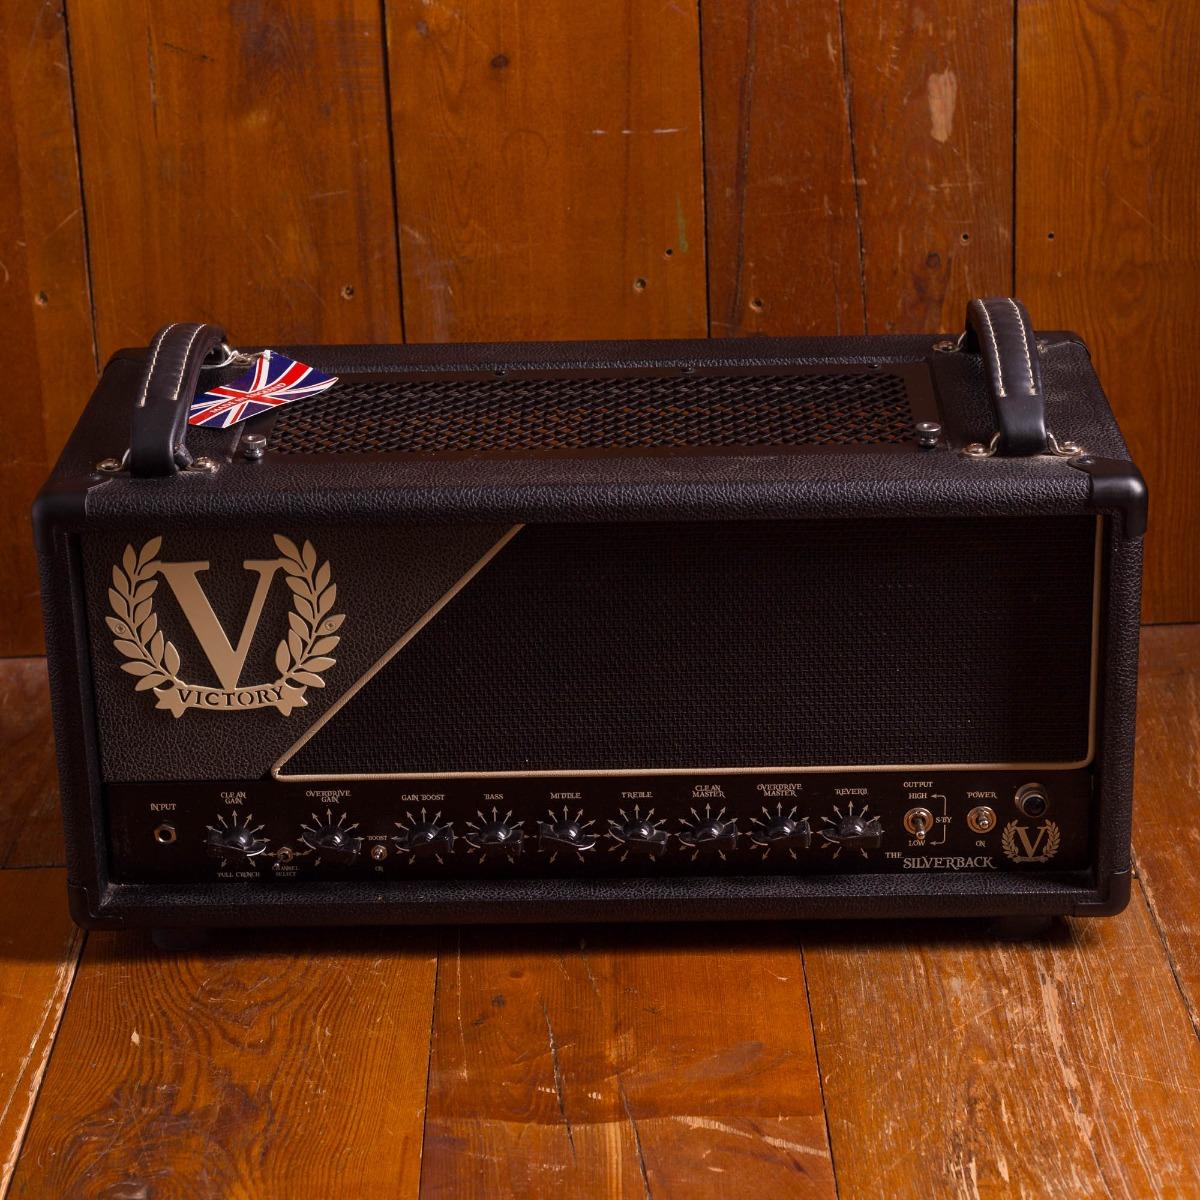 Victory Amplification Silverback